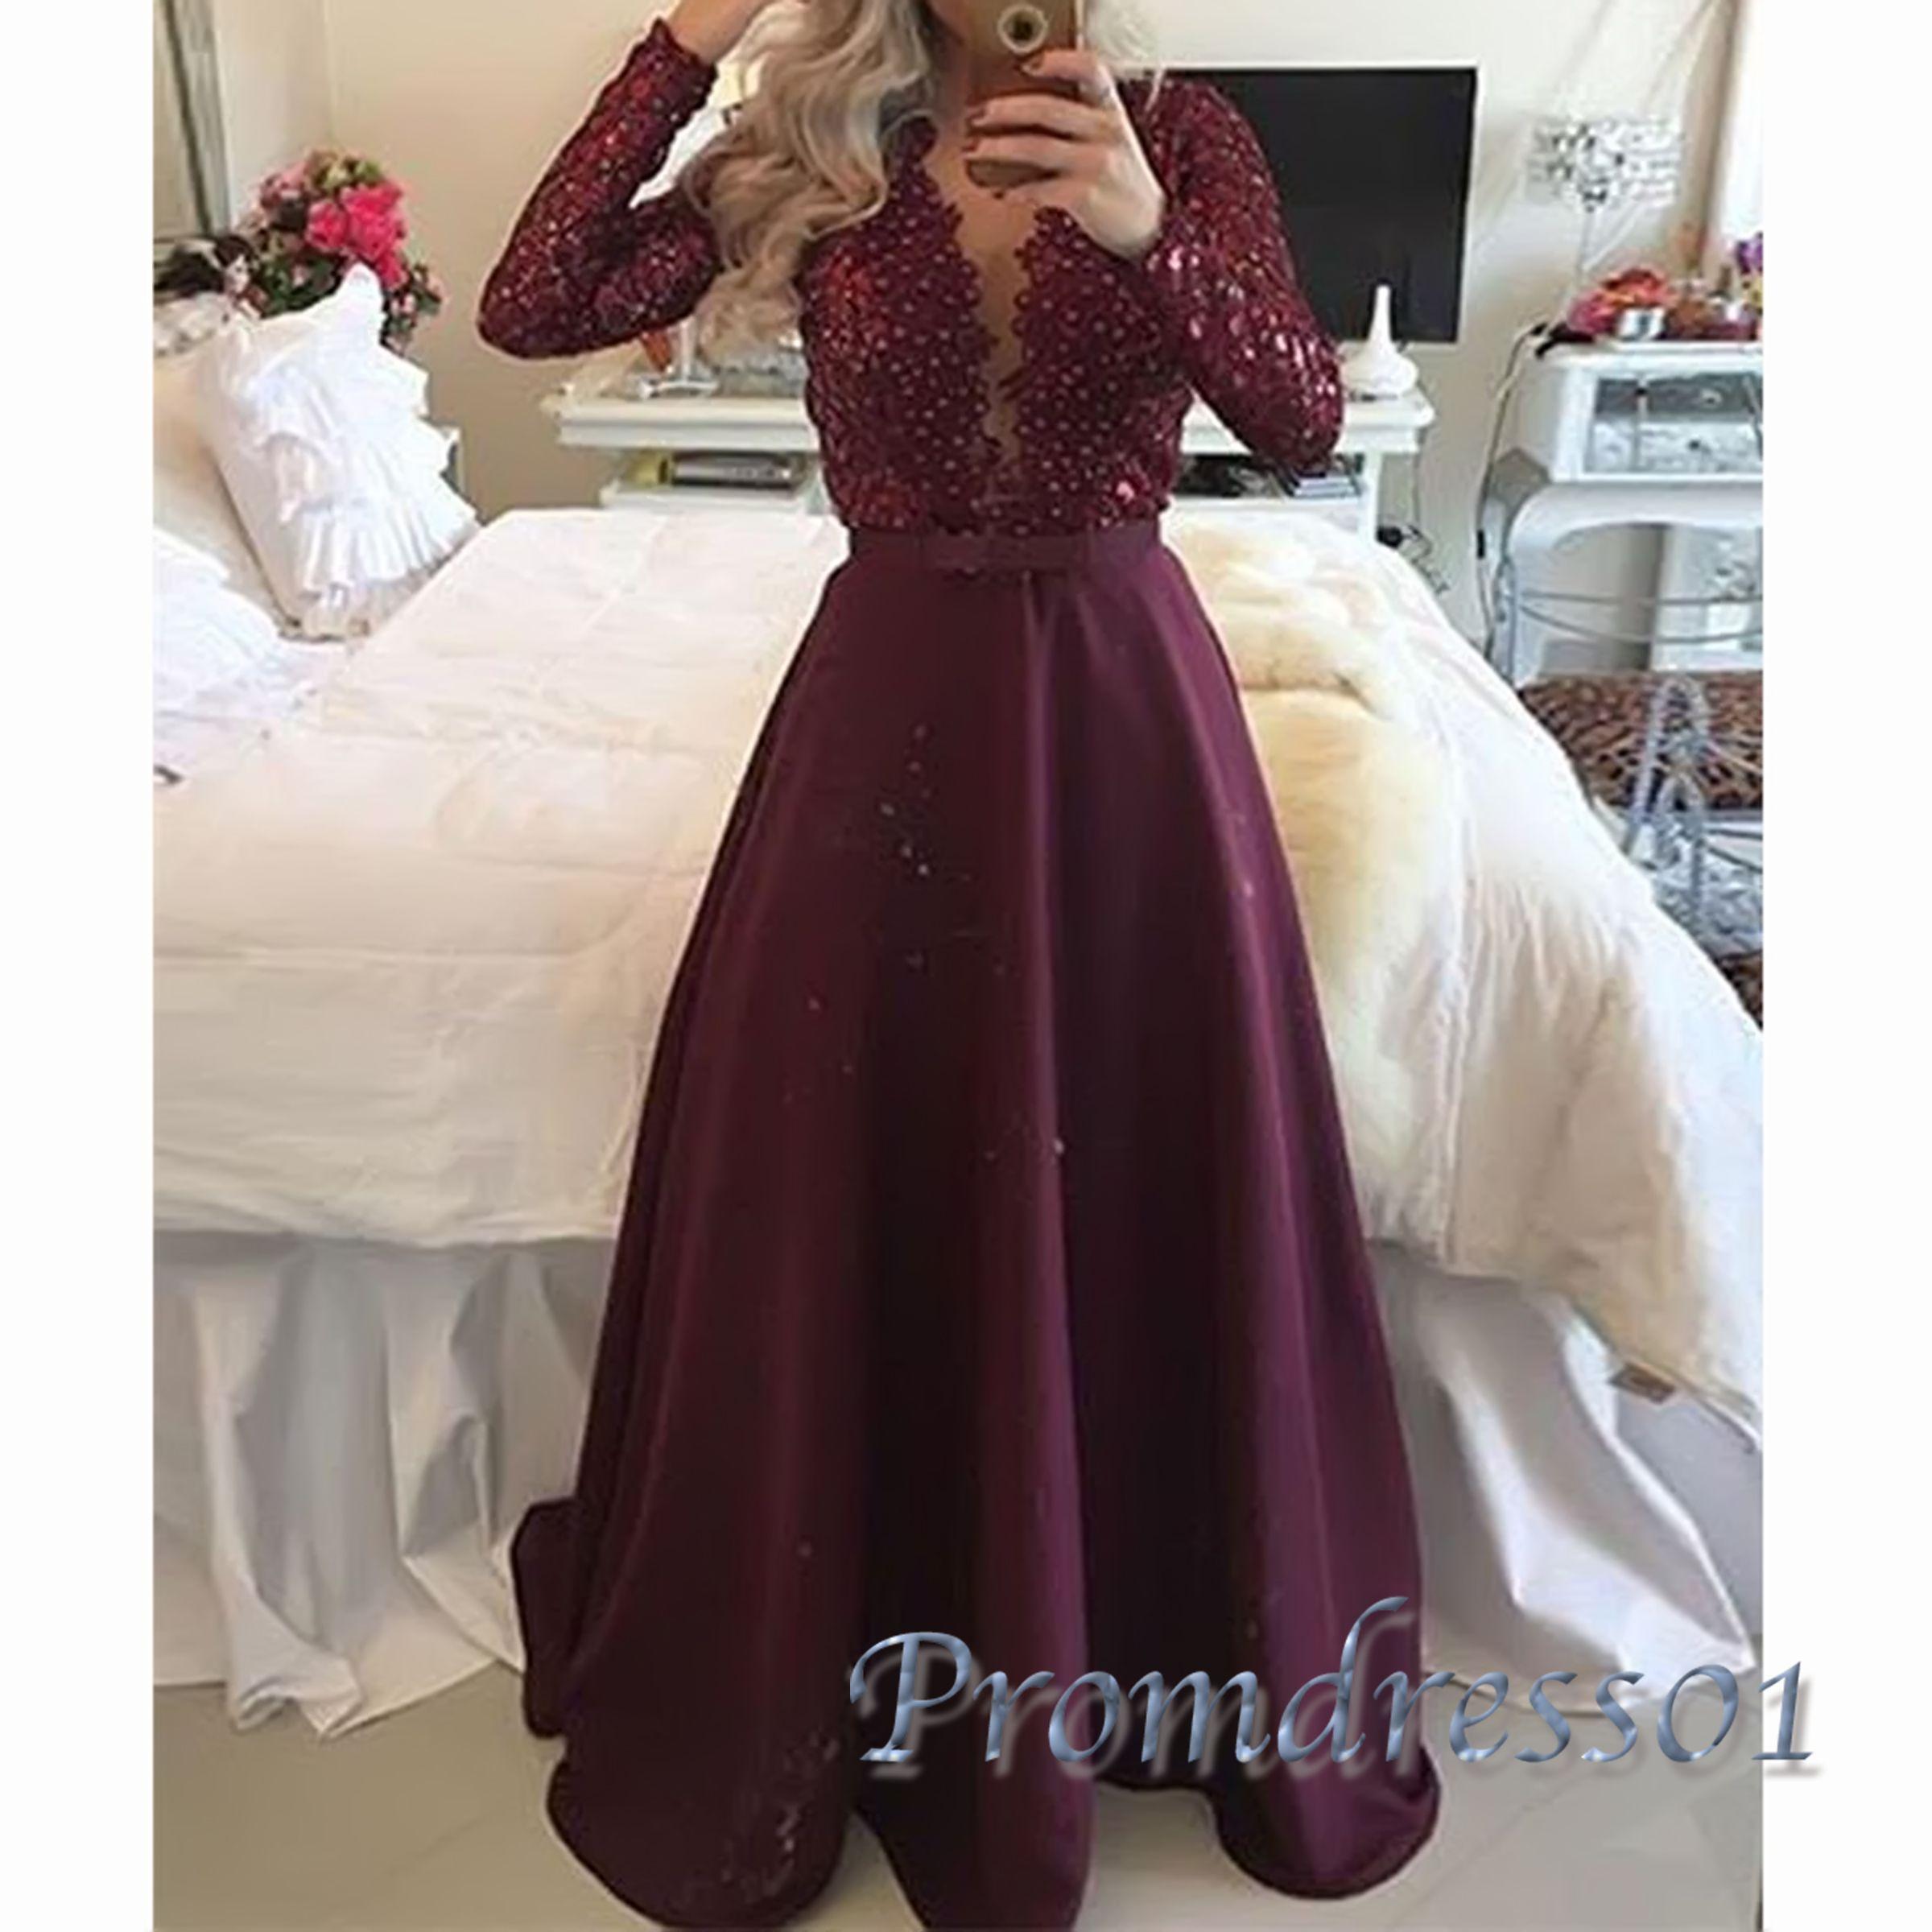 Beautiful long sleeved burgundy lace chiffon modest prom dress with